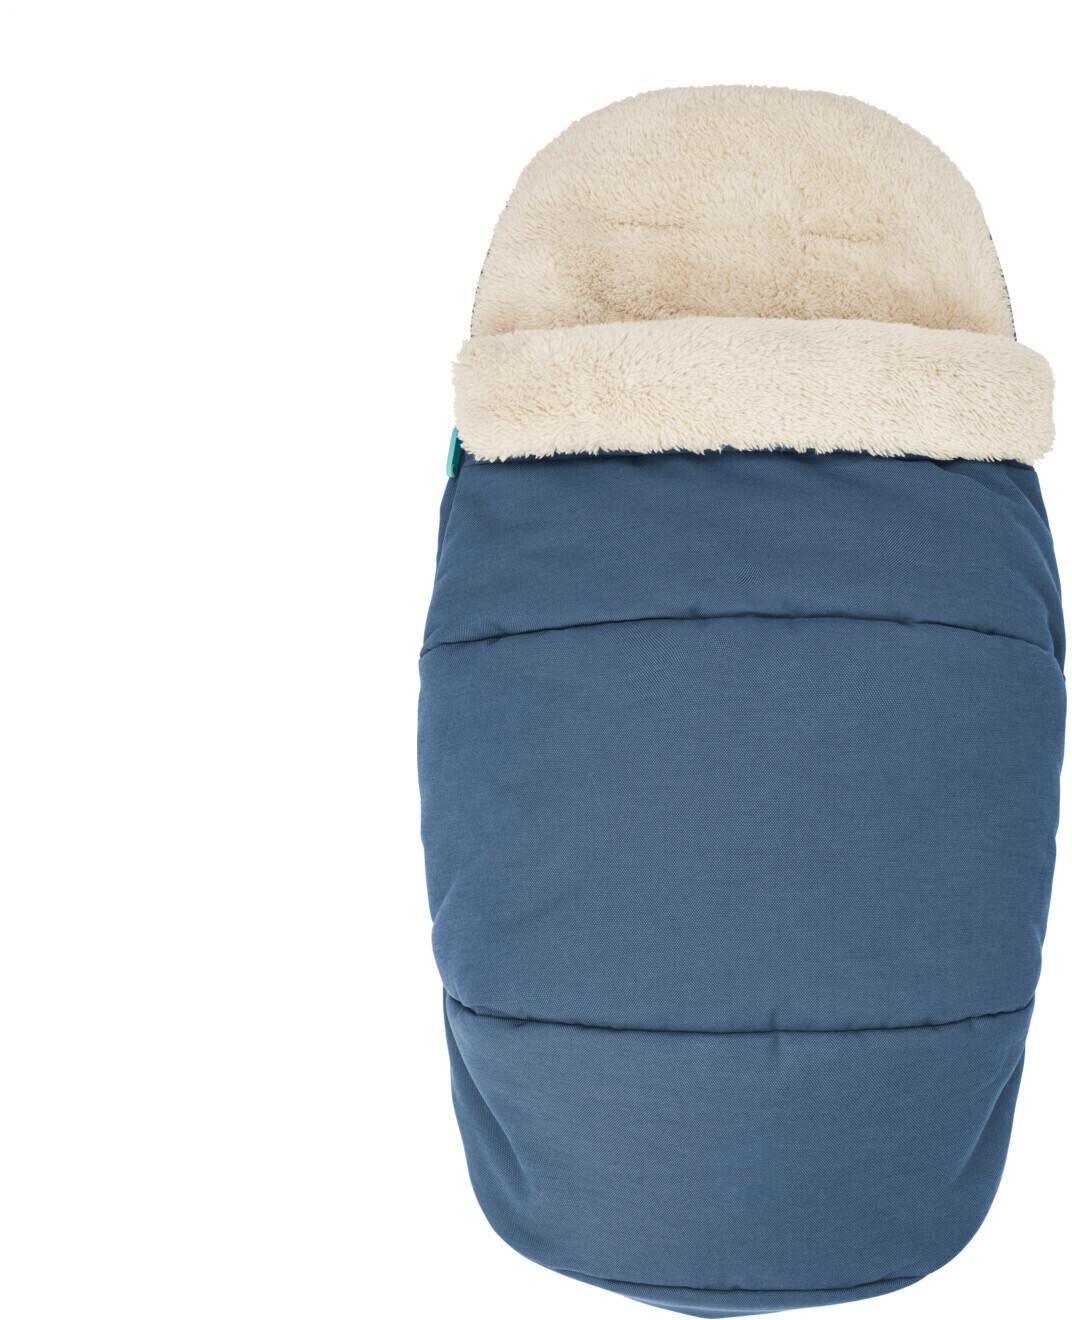 Maxi-Cosi 2-in-1 Essential Blue